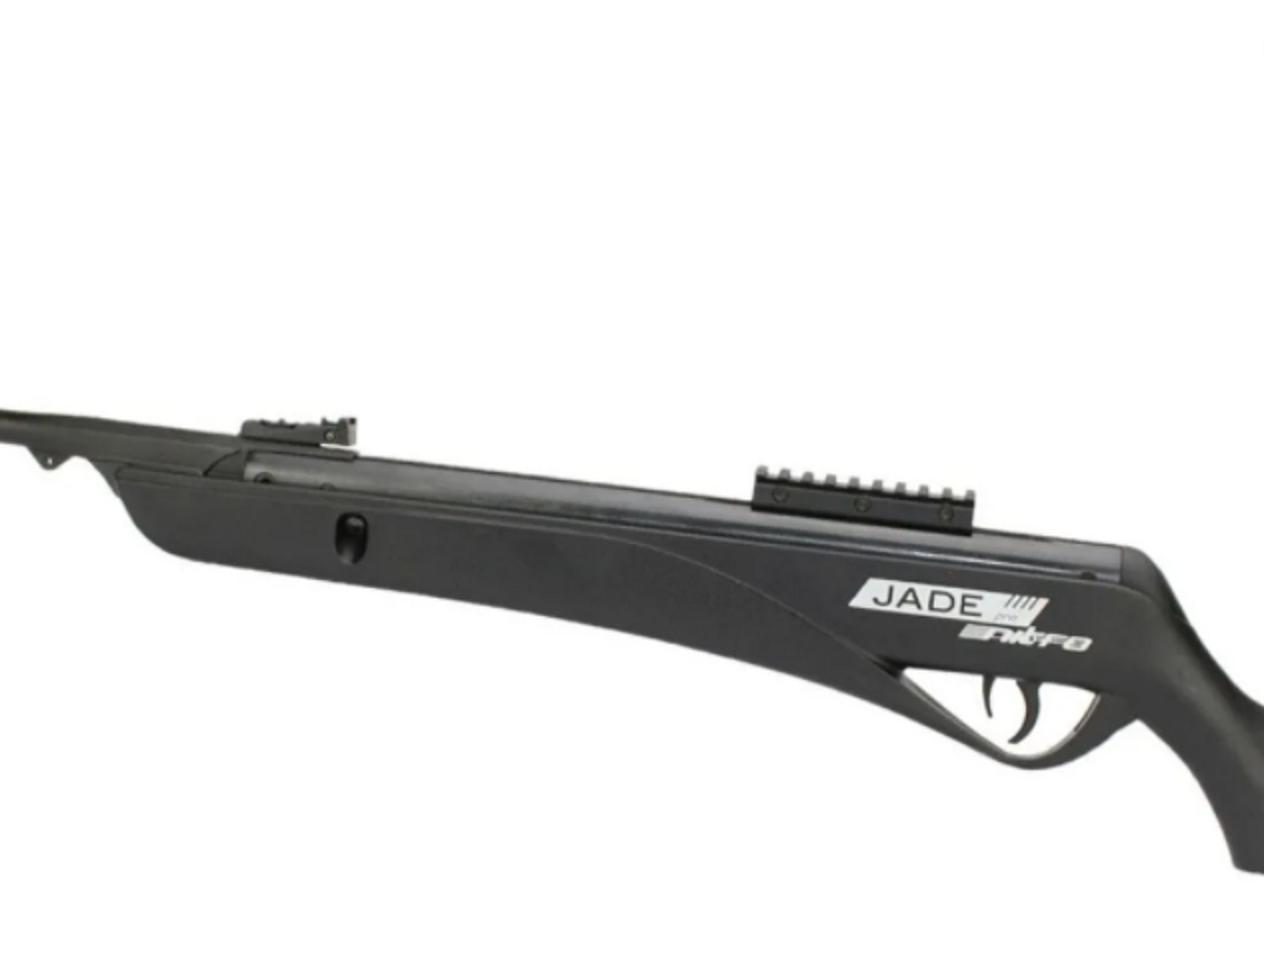 Carabina de Pressão CBC 5.5mm Jade Pro Nitro Ox PP